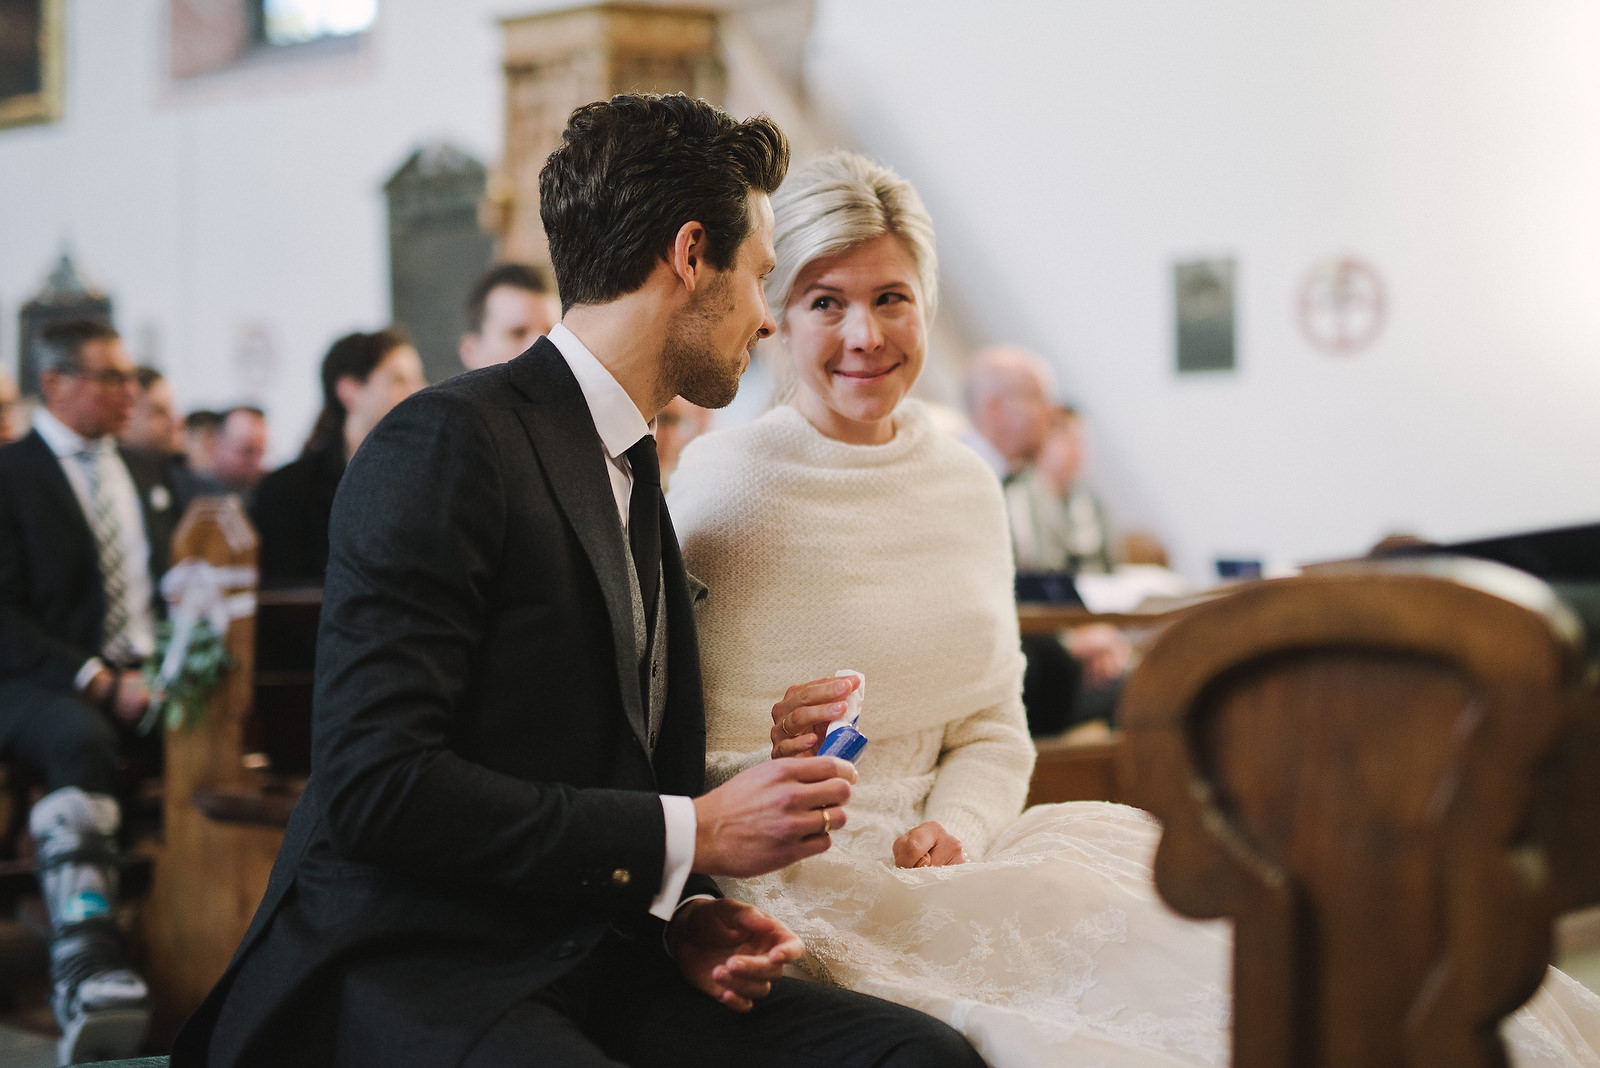 Fotograf Konstanz - Silvester Wedding in Hagnau / Friedrichshafen at Lake of Constance  - 17 -